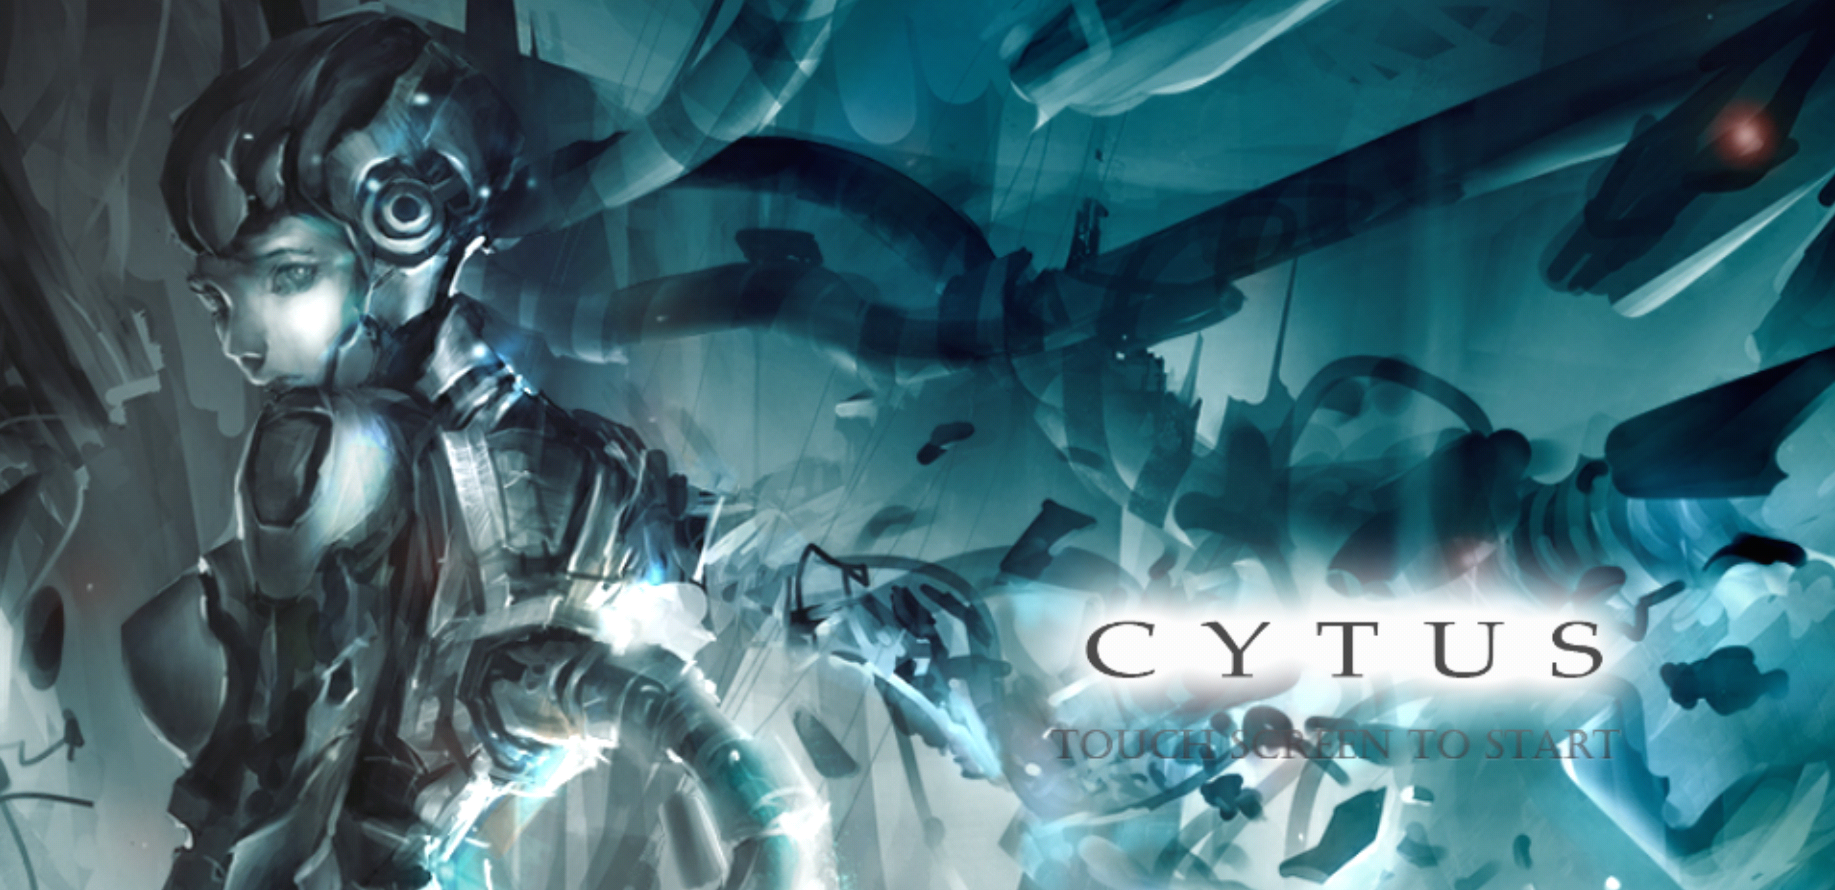 Cytus 凭什么席卷 65 个国家 App Store 排行榜?